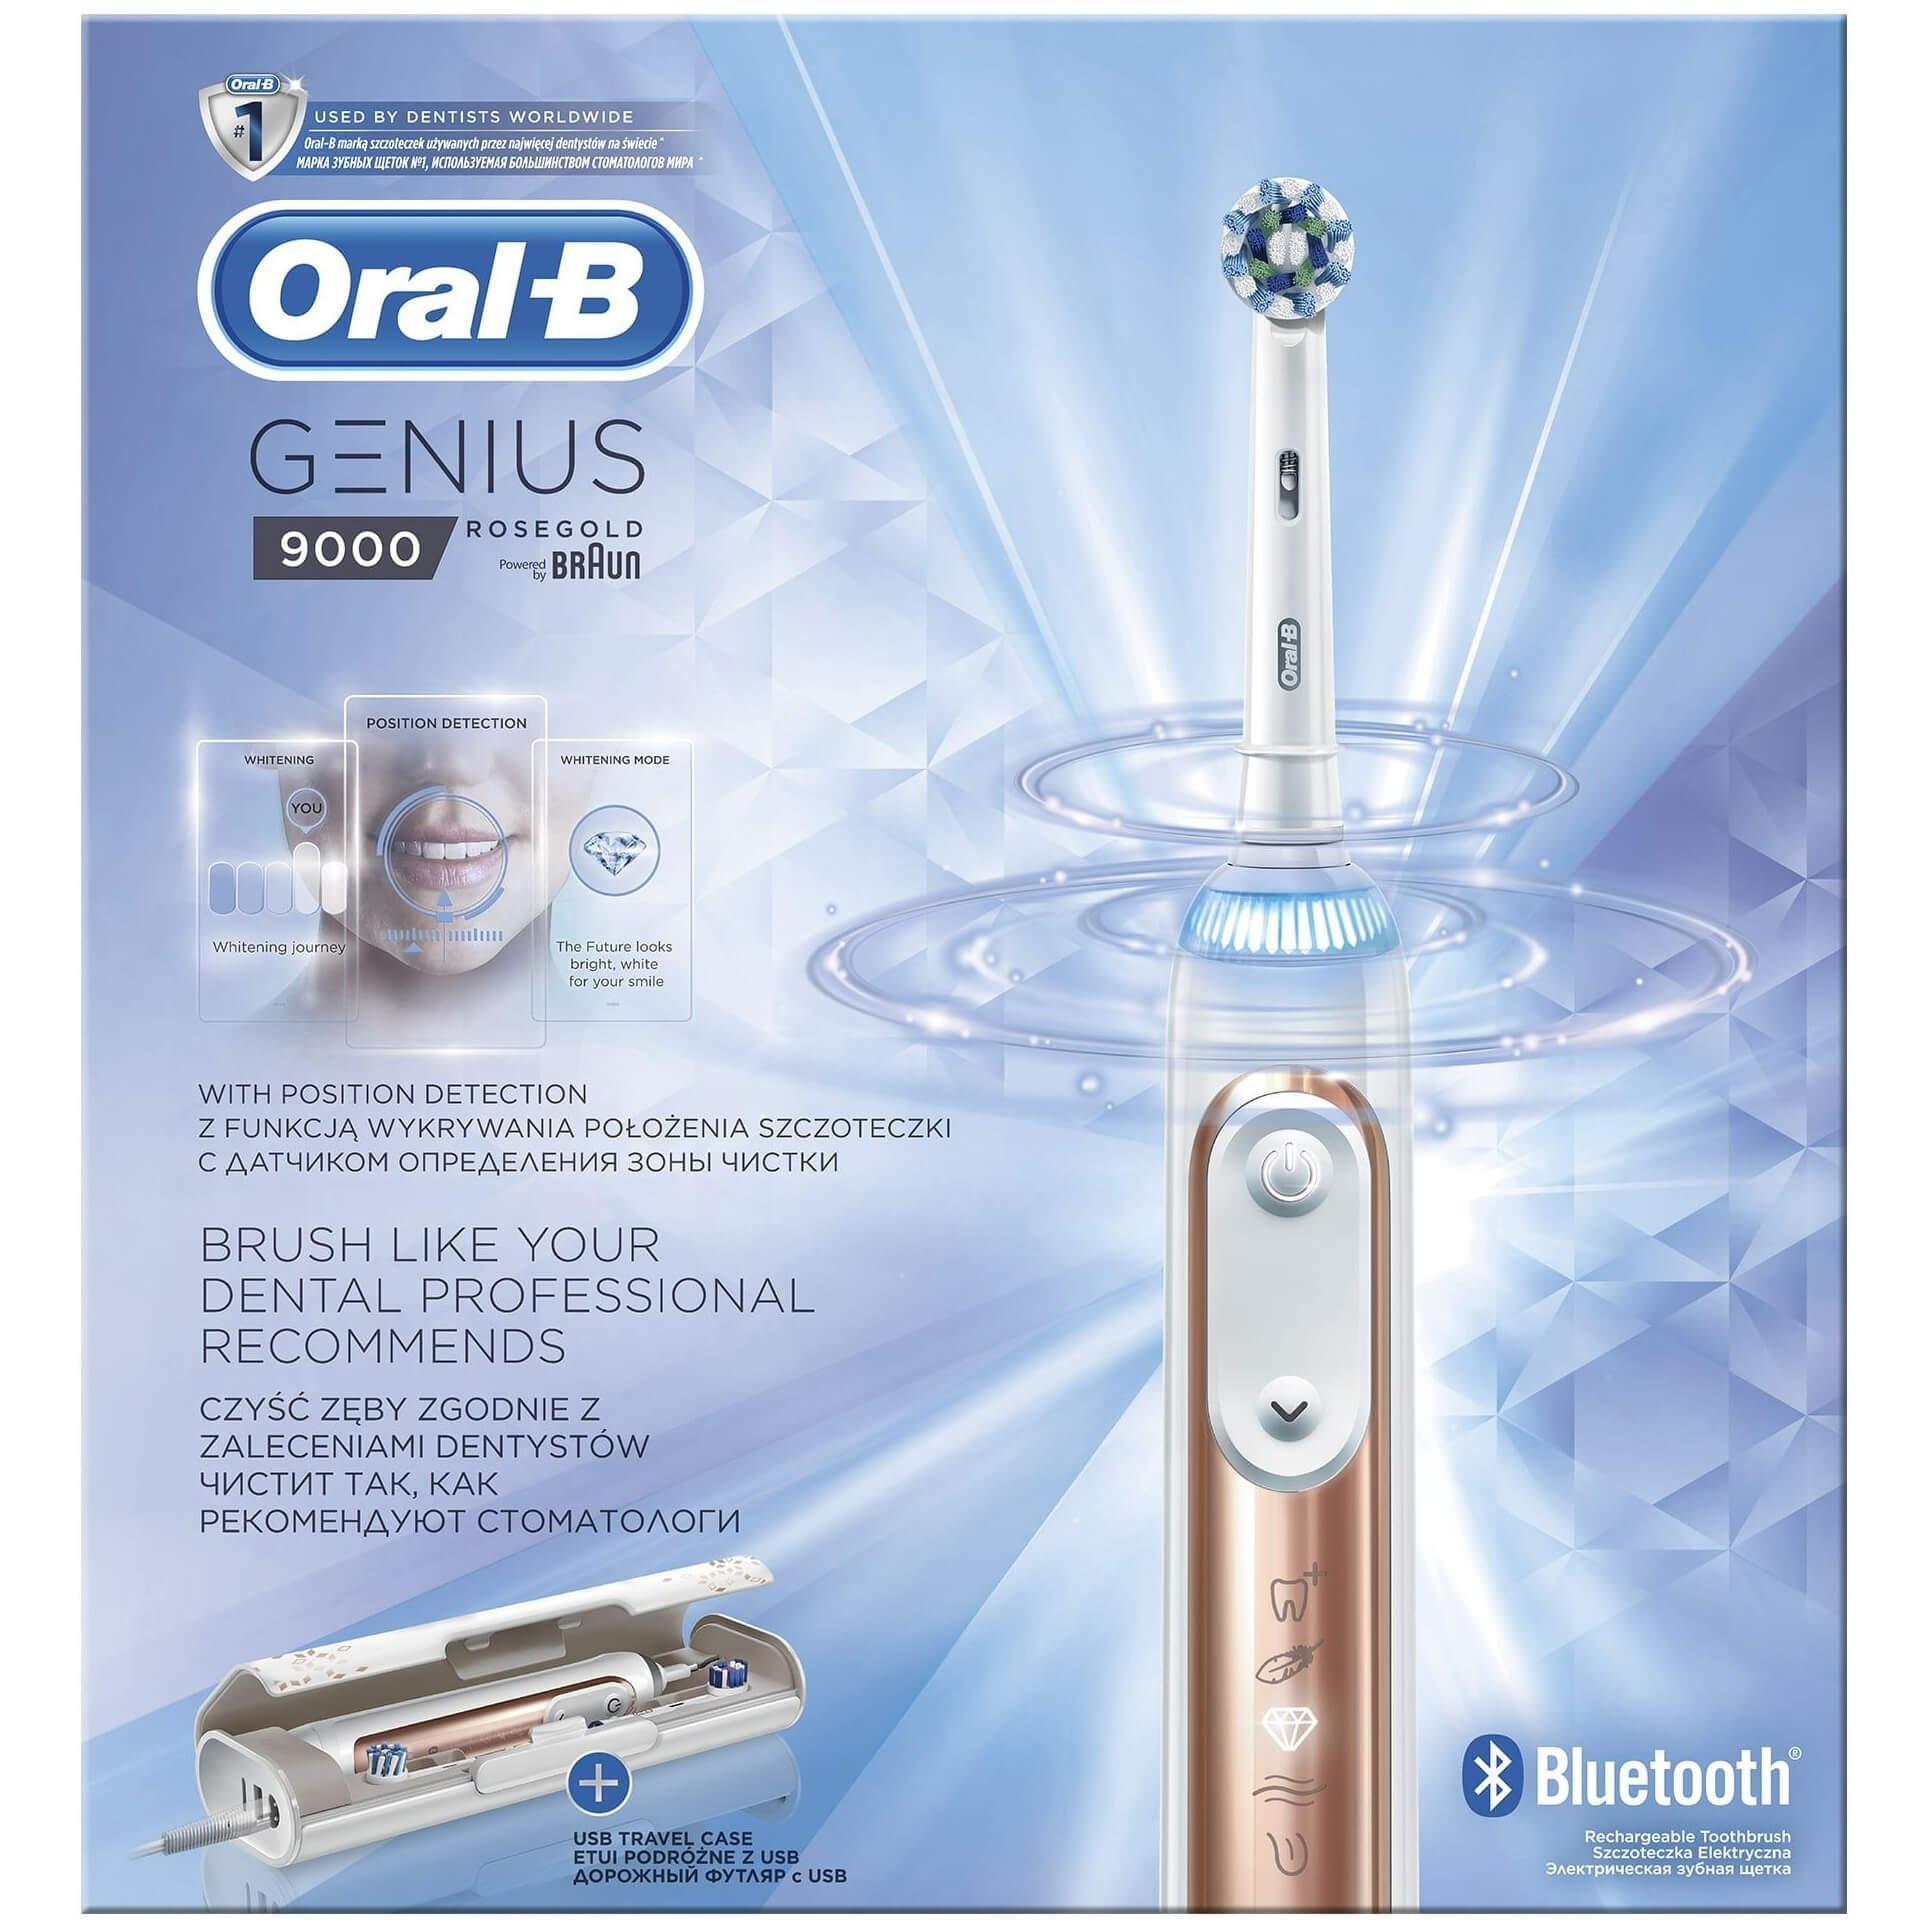 Oral-B Genius 9000 Rose Gold Ηλεκτρική Οδοντόβουρτσα με τη Μοναδική Τεχνολογία Εντοπισμού Θέσης Βουρτσίσματος 1 Τεμάχιο